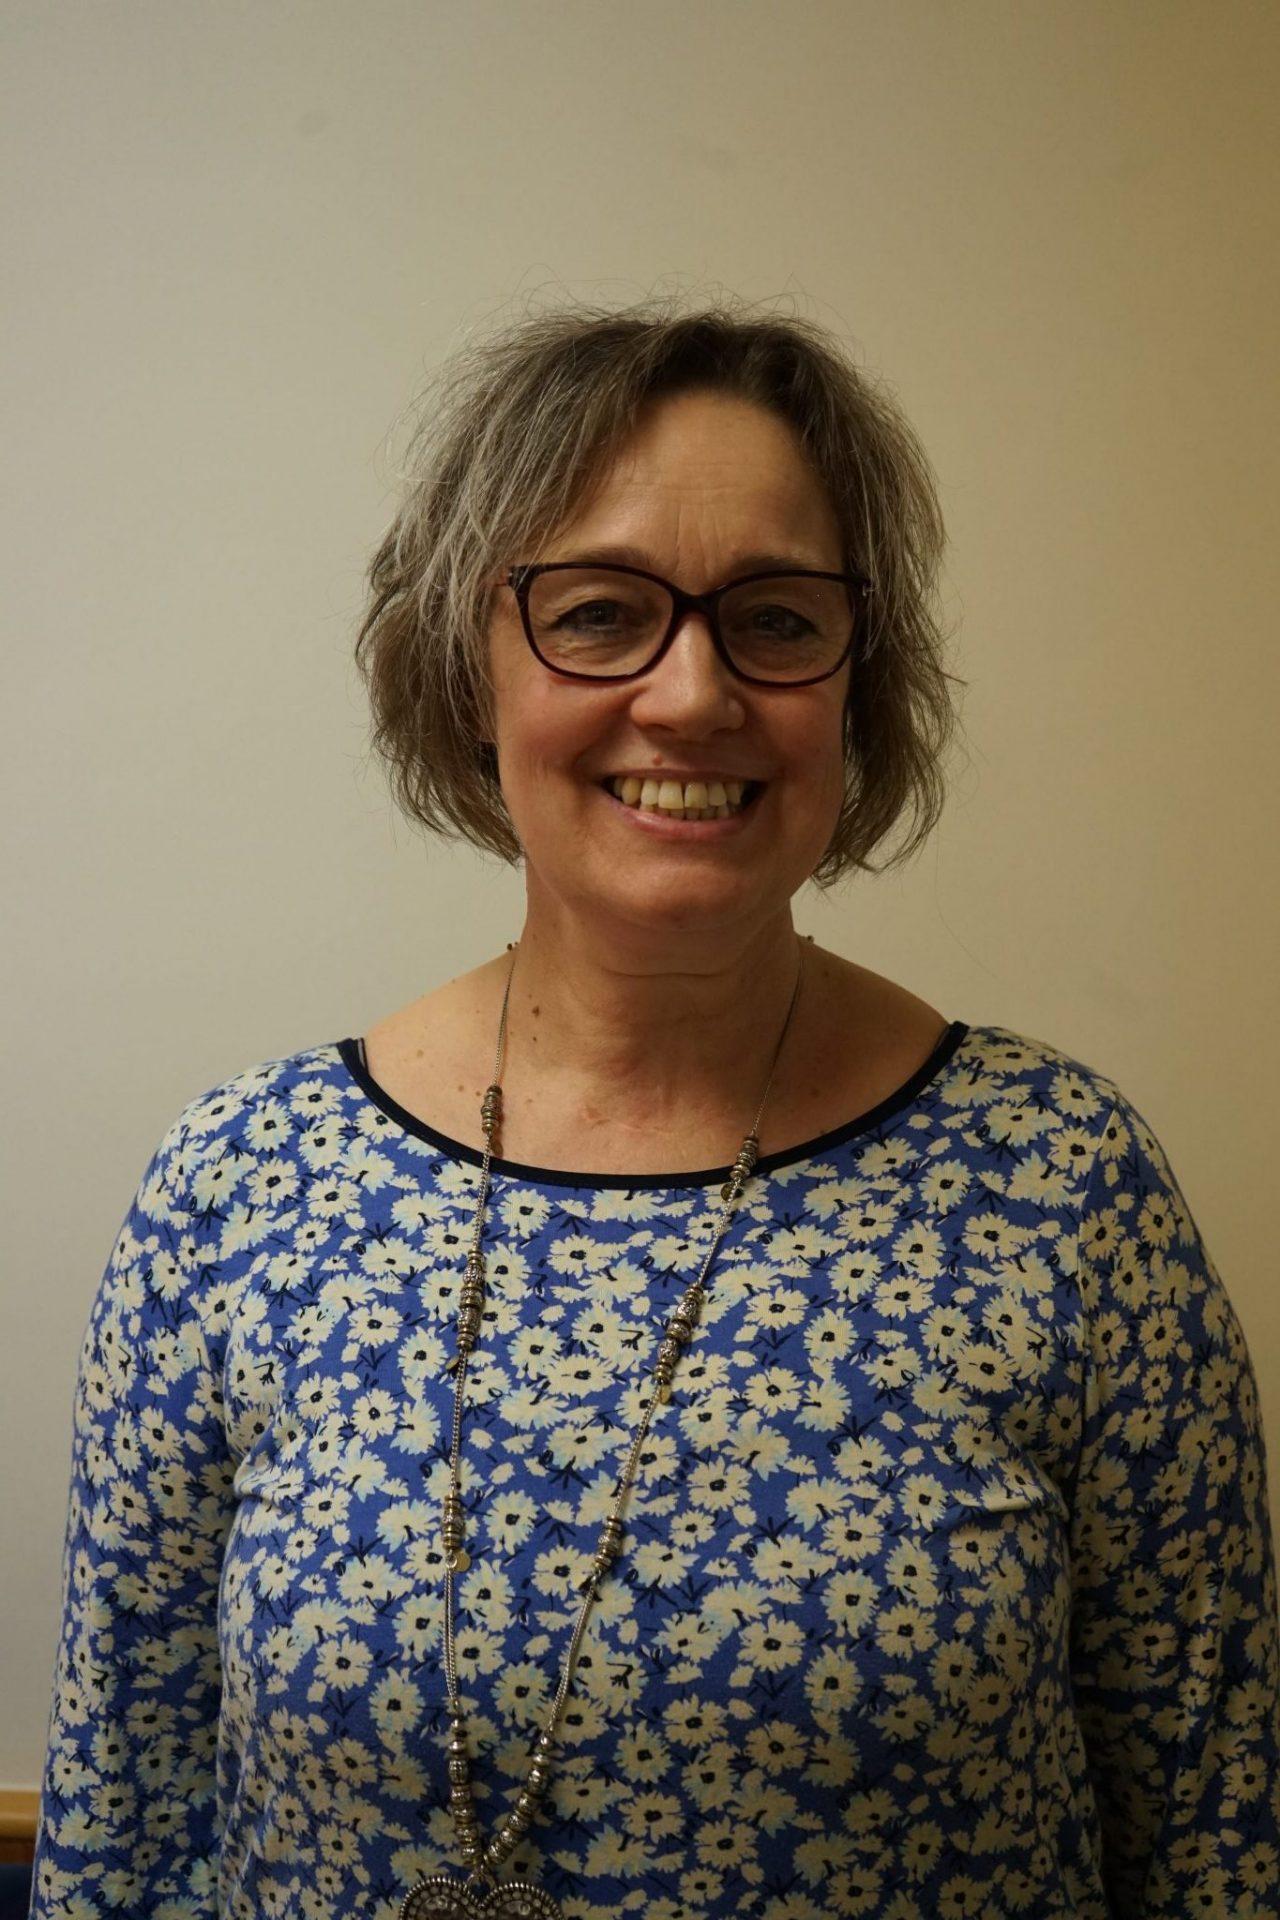 Suzanne Camp